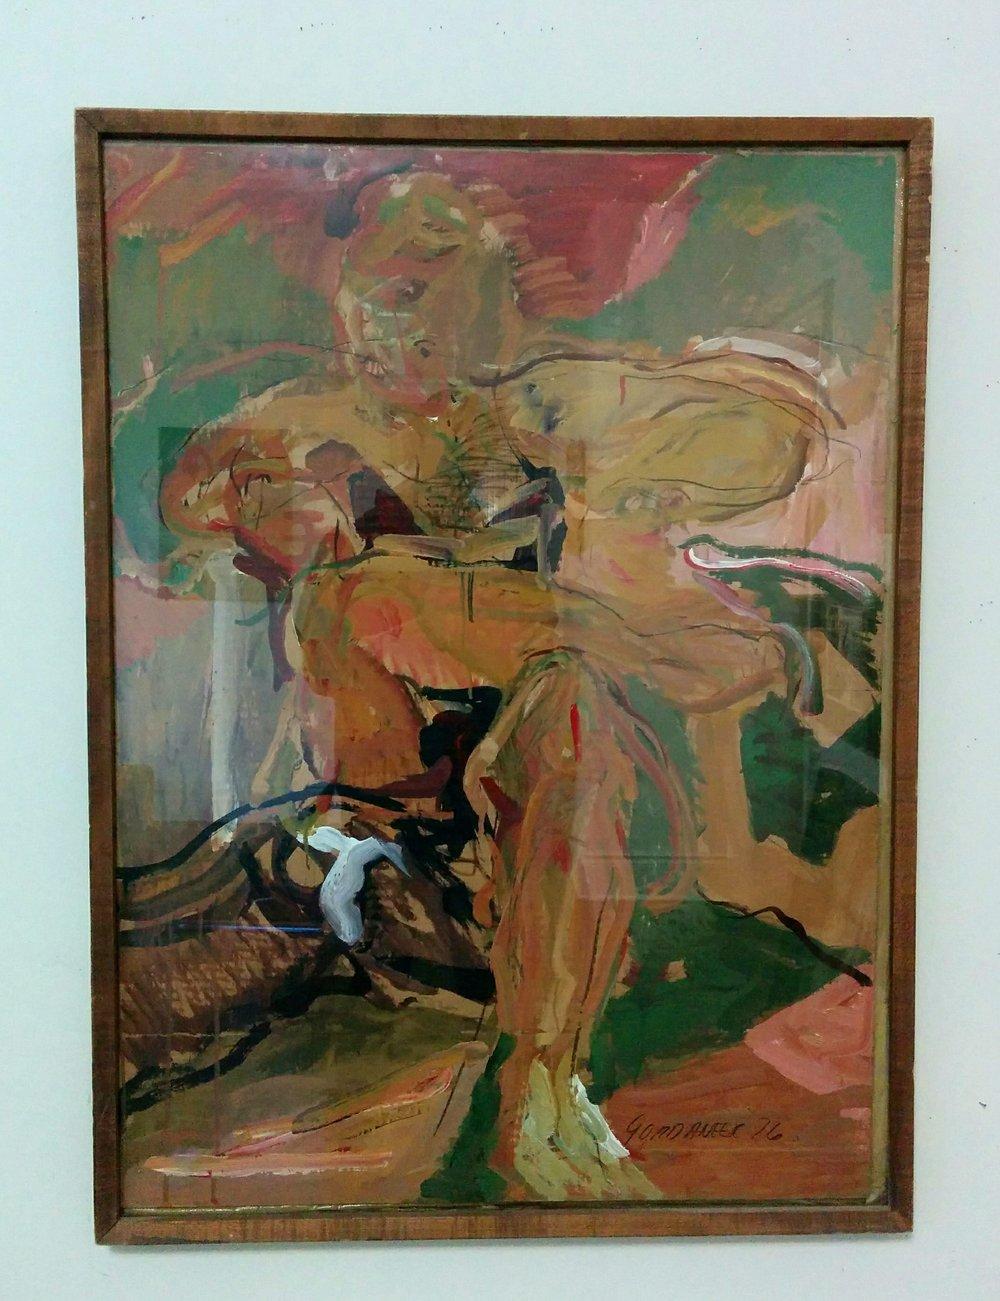 James Gordaneer(Canadian, 1933-2016)Figure on Patio - 1976Acrylic on cardboard28